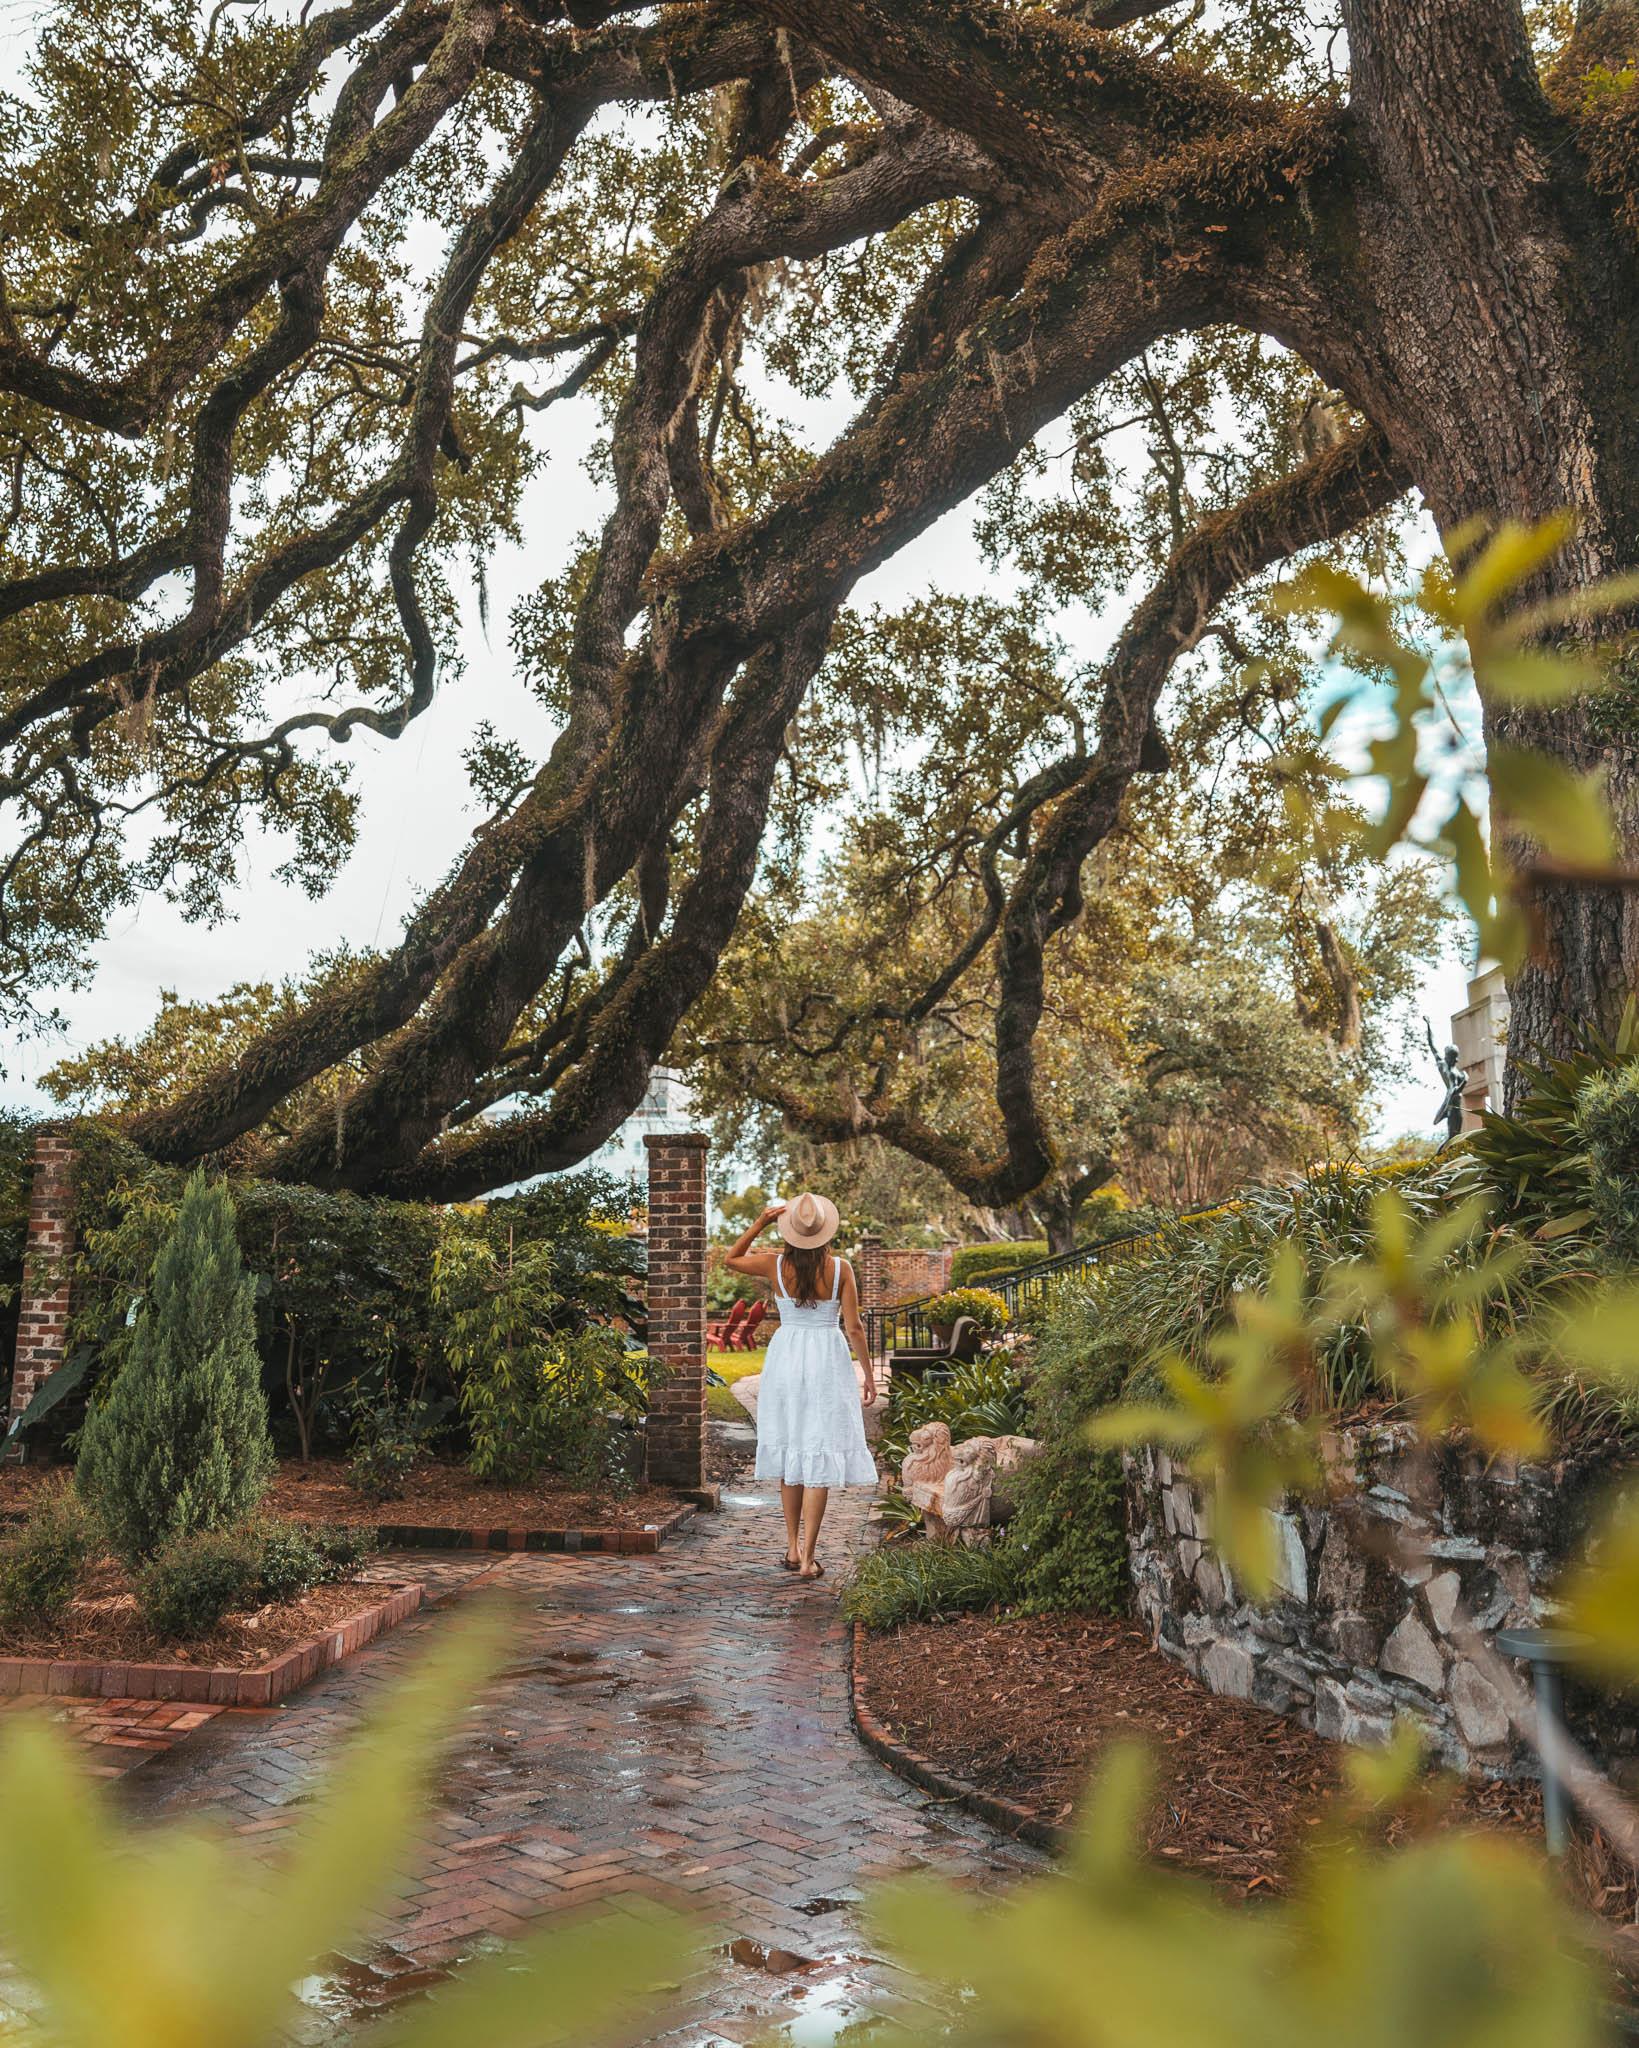 Cummer Museum gardens ~ Top Things to Do in Jacksonville, Florida ~ #readysetjetset #florida #jax #jacksonville #blogpost #travel